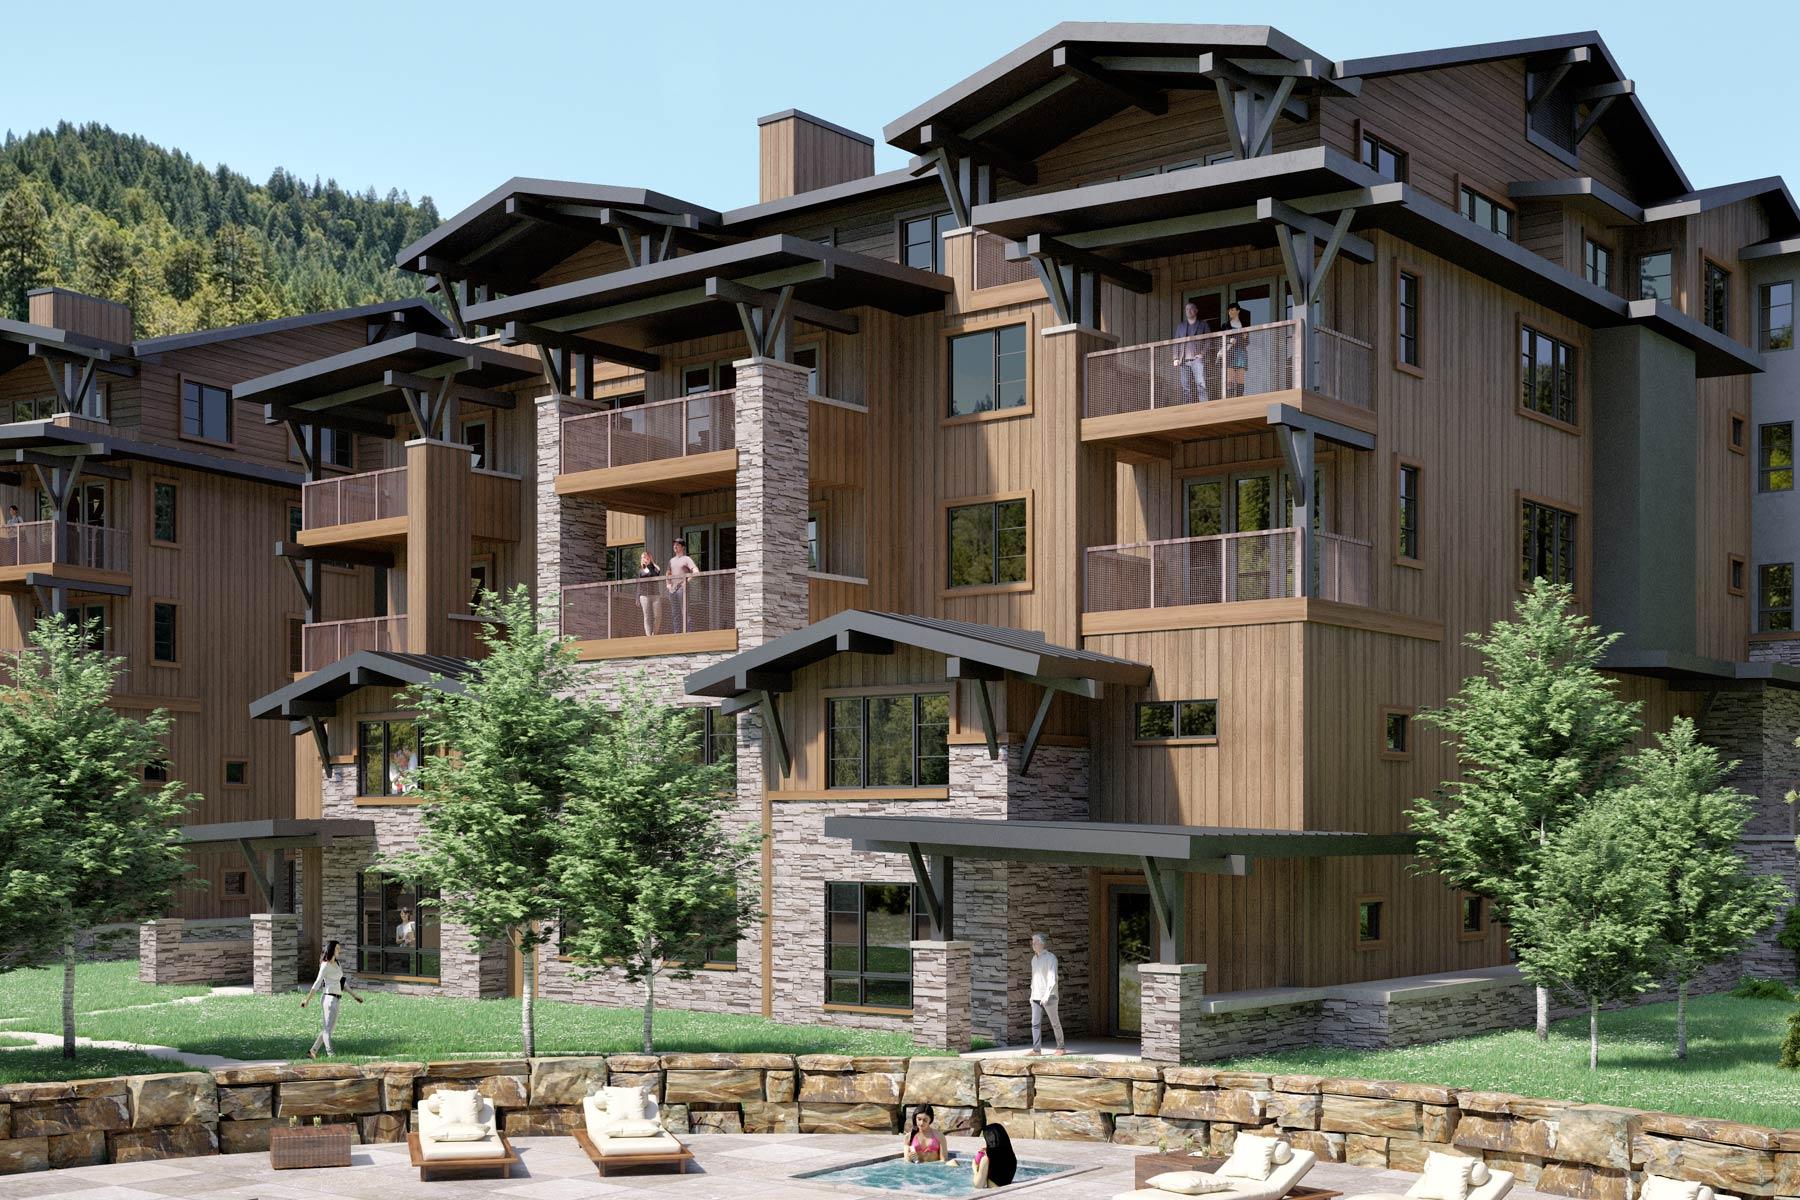 共管物業 為 出售 在 New Construction Mountain Lake Condo 2 Summit View Road, Unit 403B Big Sky, 蒙大拿州 59716 美國